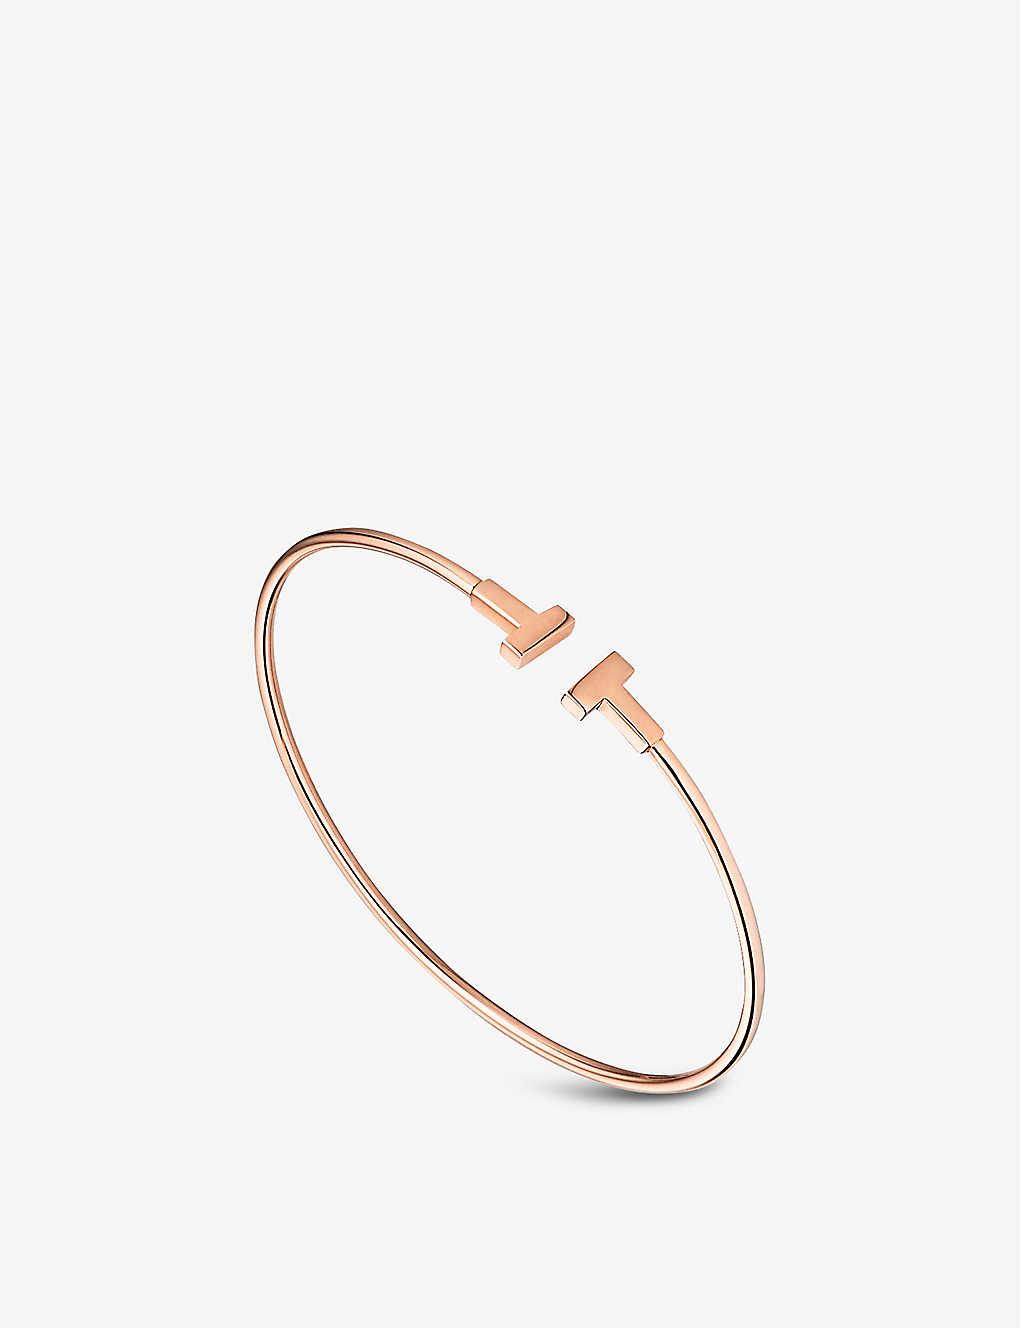 0fa61b10f TIFFANY & CO - Tiffany T narrow wire bracelet in 18k rose gold ...